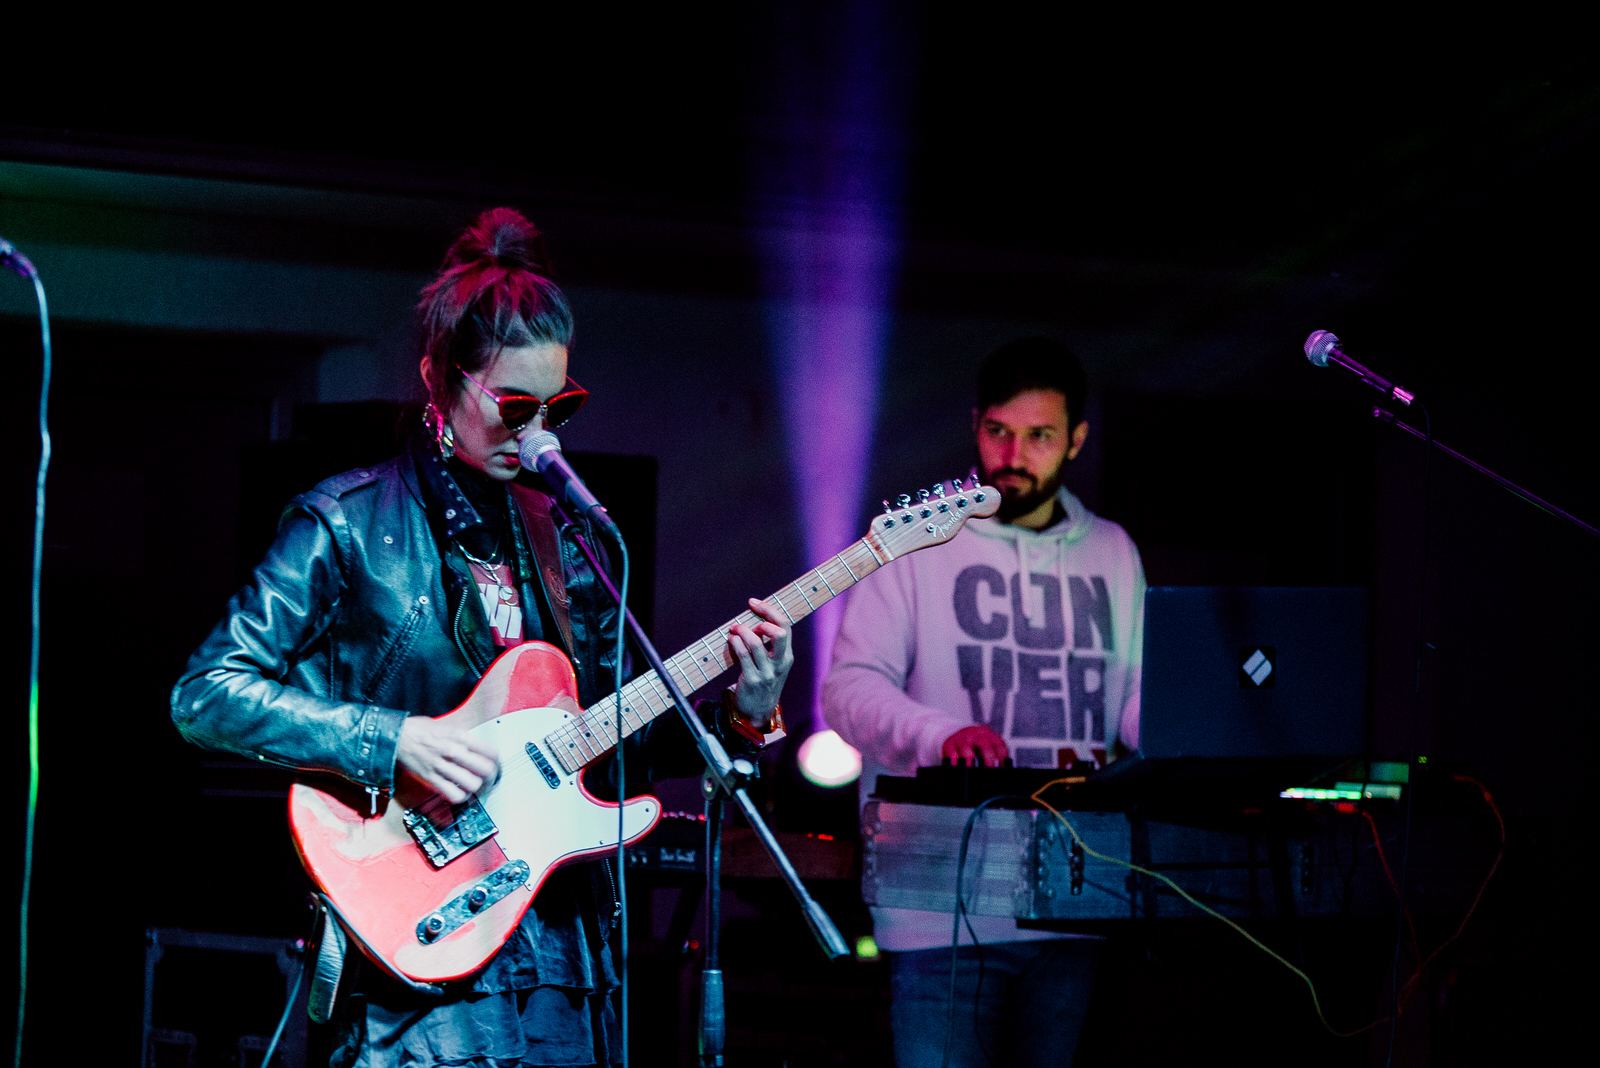 likaclub_grocks-2019_tbf-barbara-munjas-4